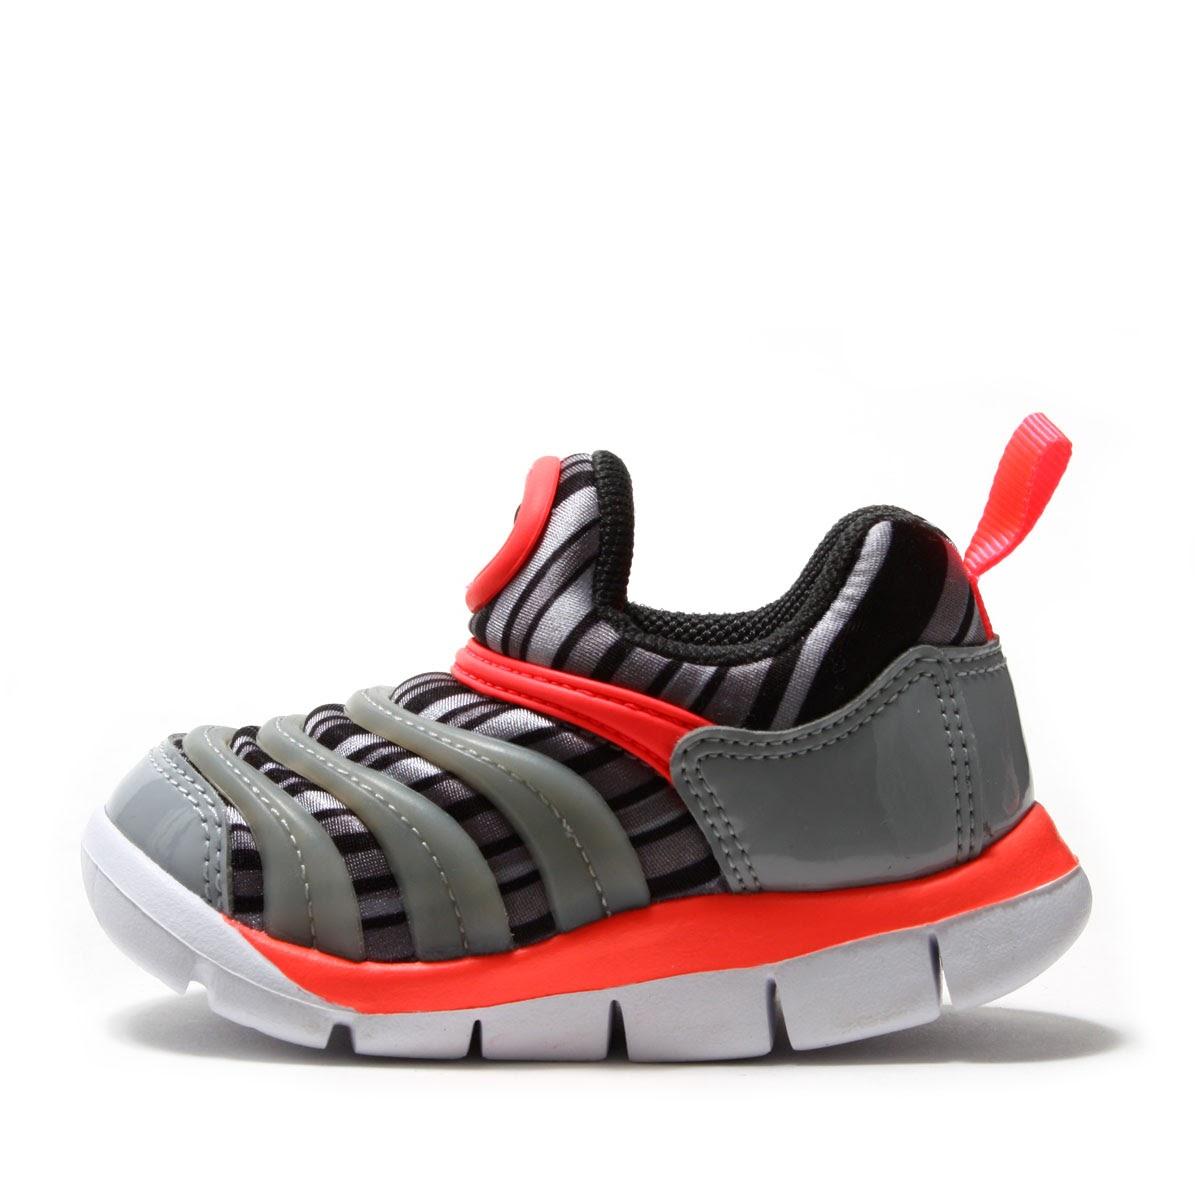 8ce163a9395a5 NIKE DYNAMO FREE PRINT (TD) (Nike dynamo-free print TD) ANTHRACITE WHITE-HOT  PUNCH-WOLF GREY 17FA-I